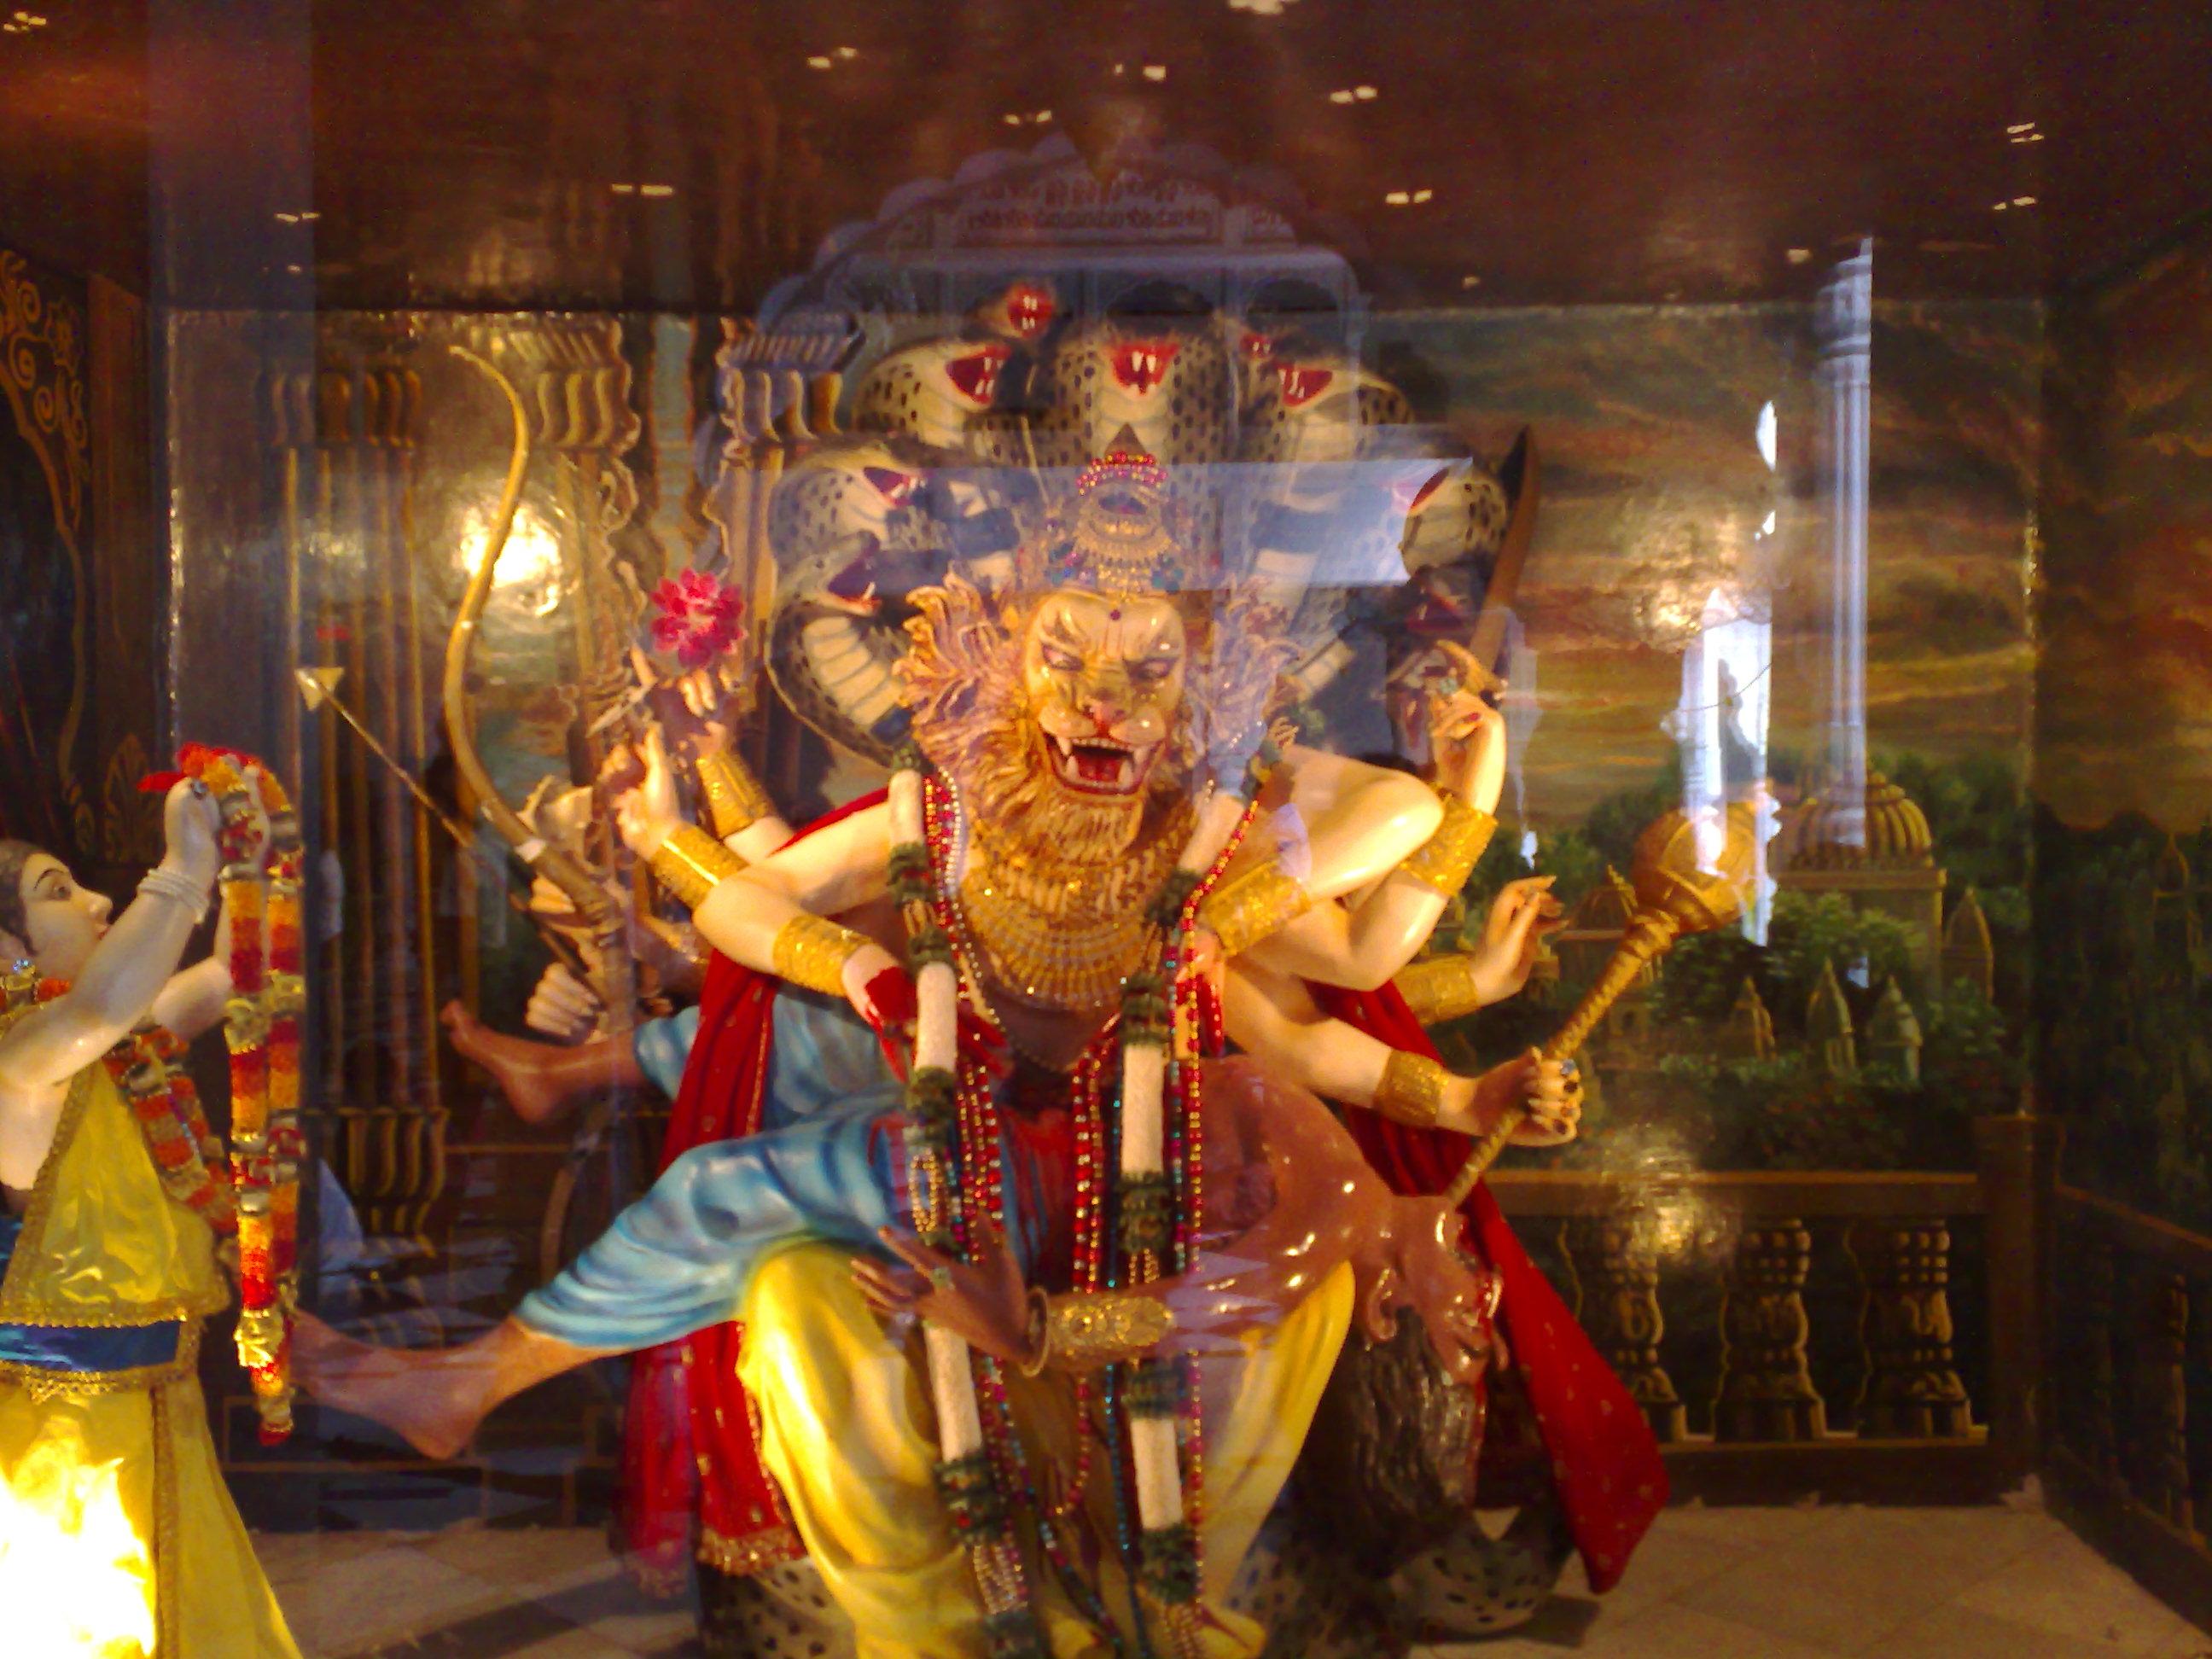 Rudra Shiva Hd Wallpaper Illustrations Of Indian Gods Pics